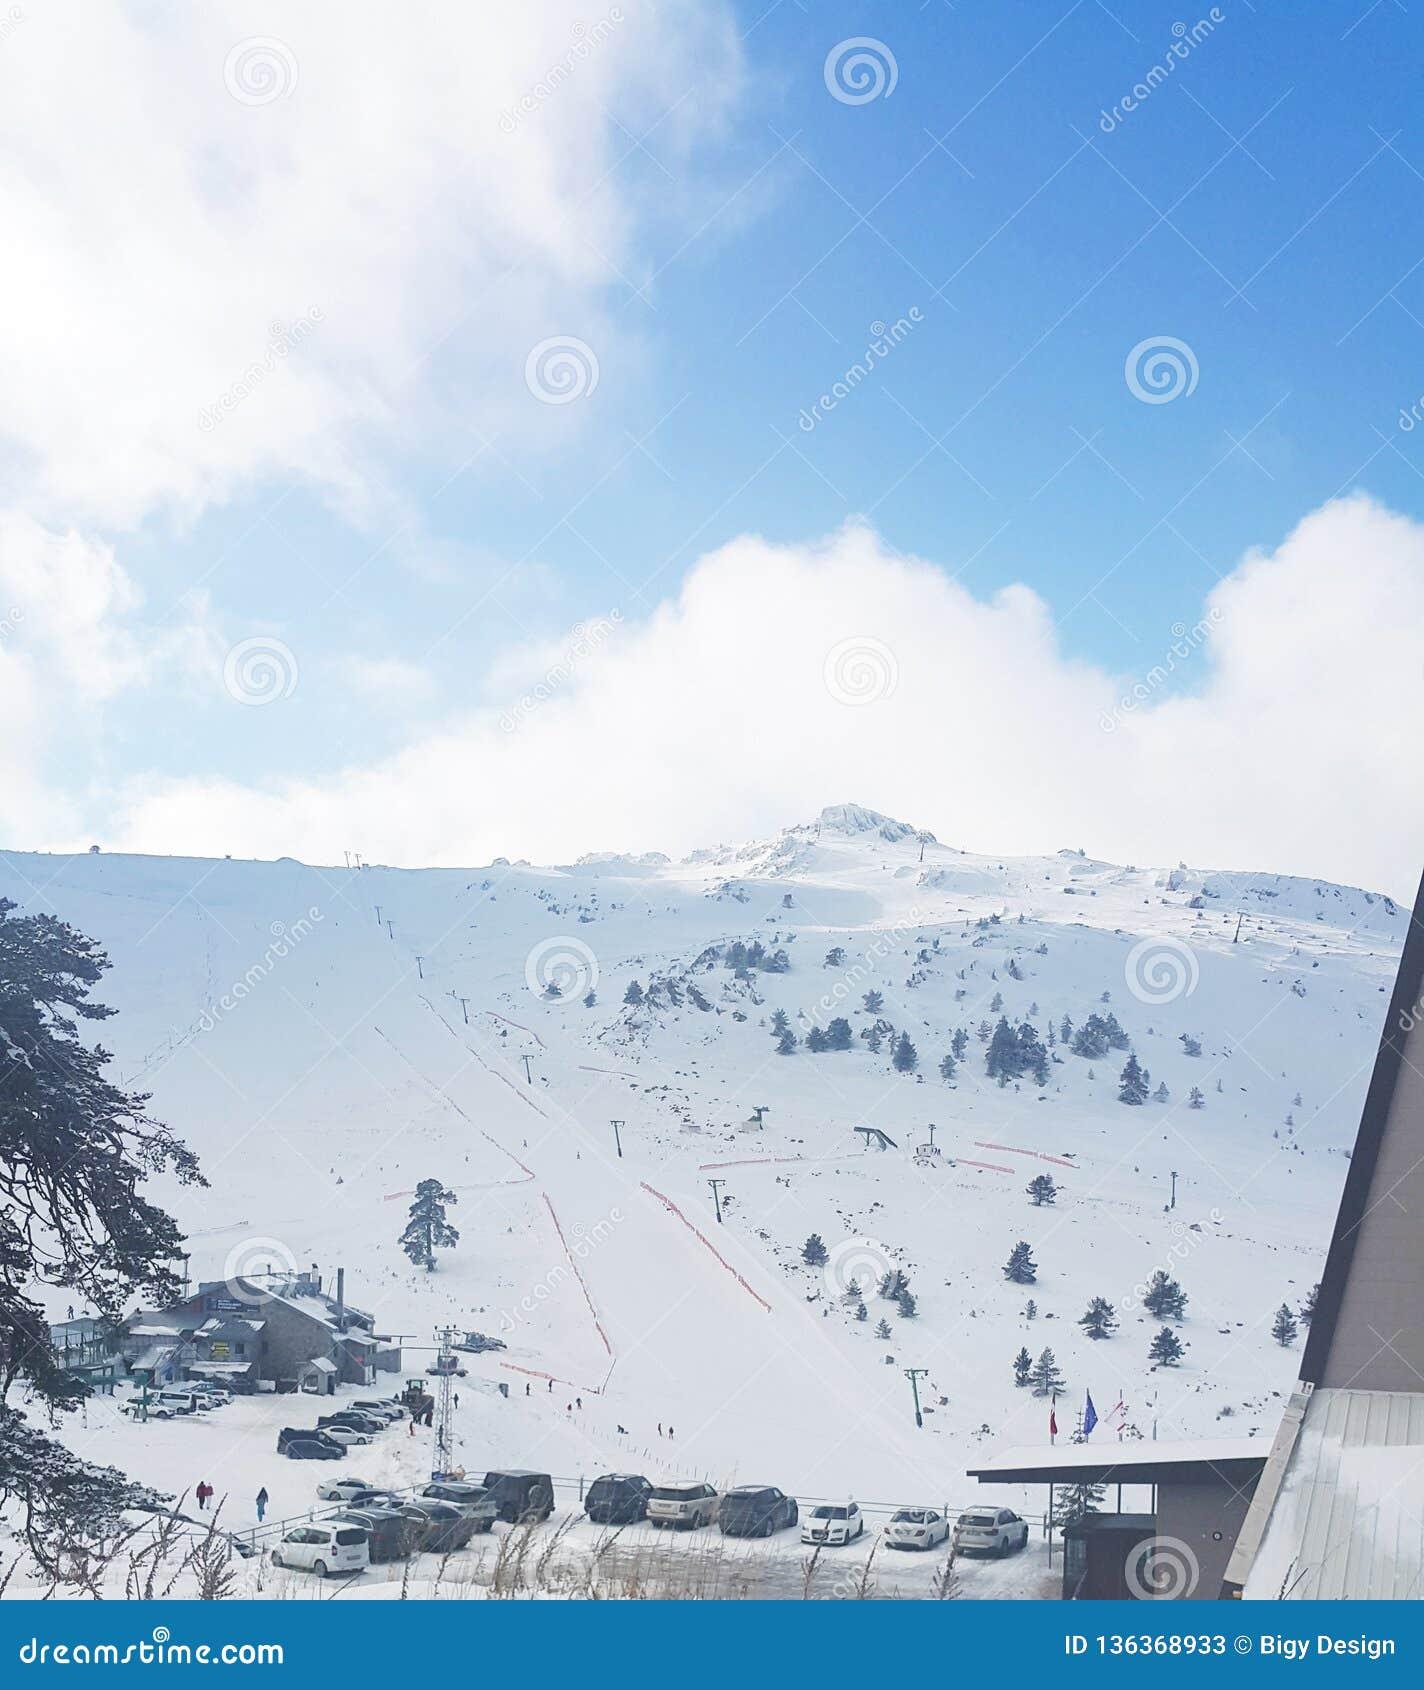 Snow breaks and fun